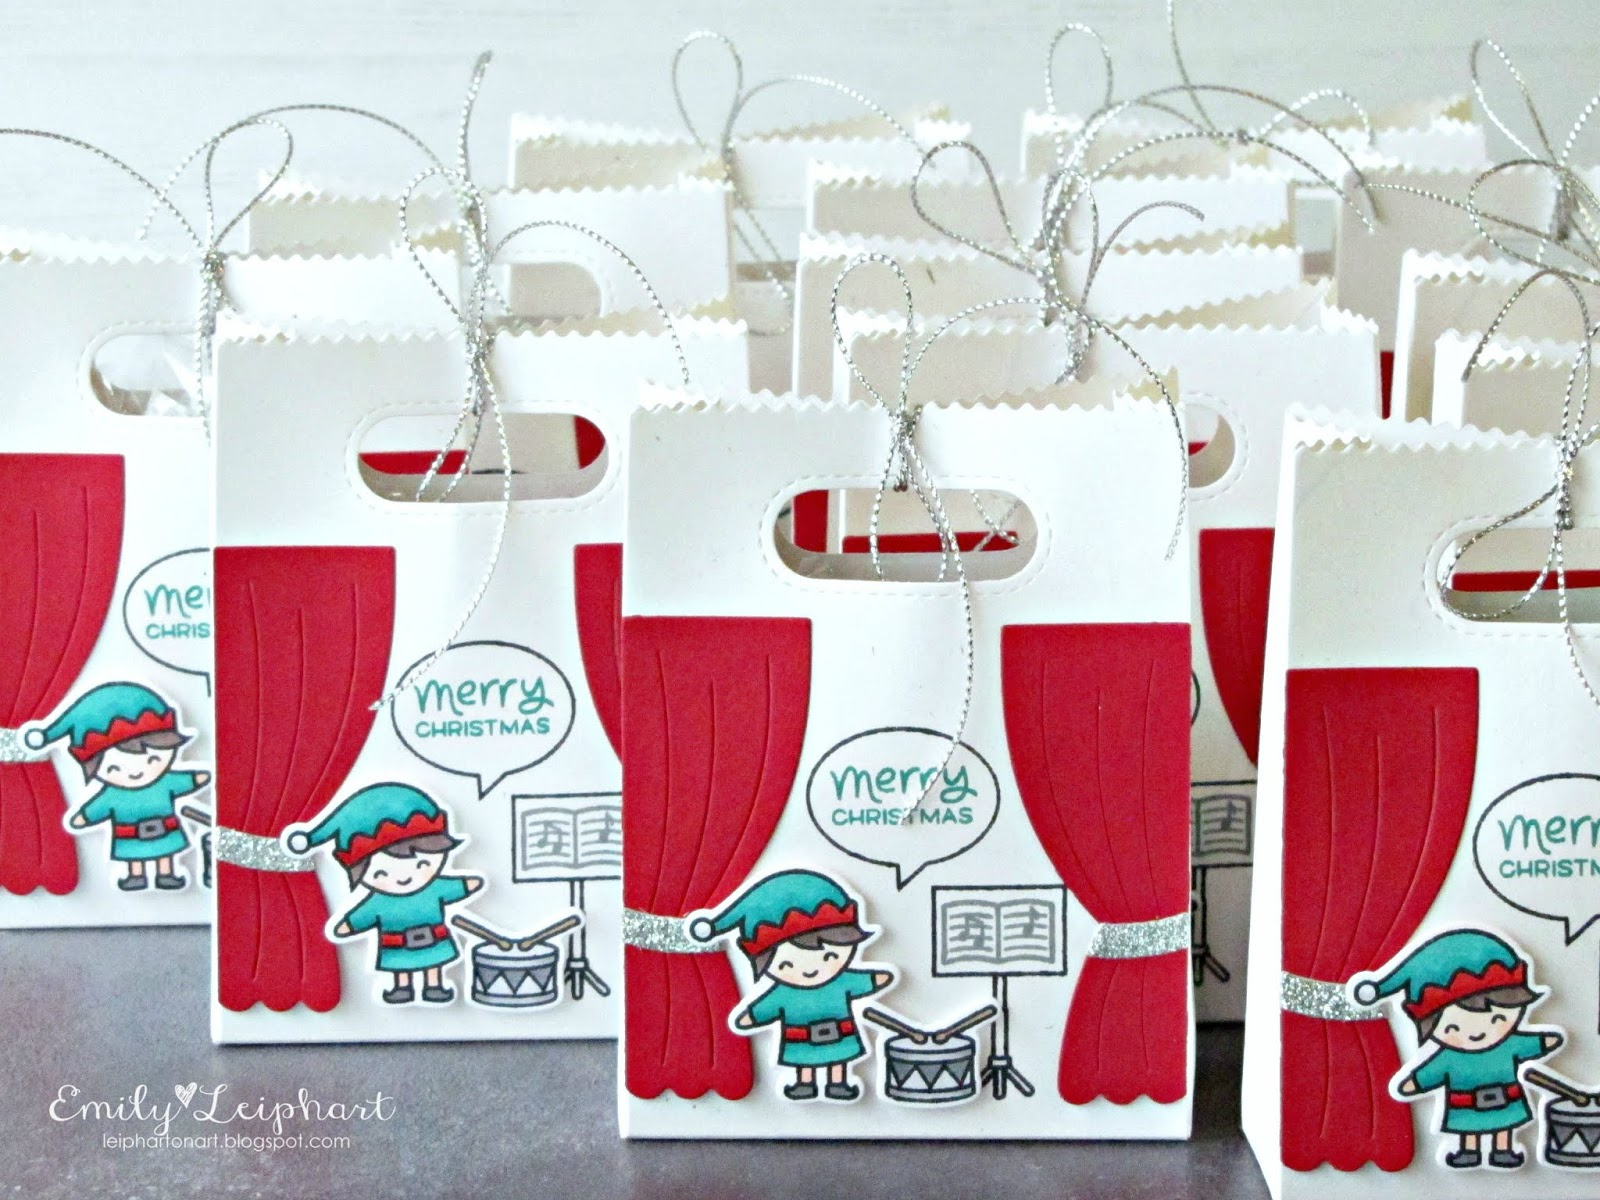 Christmas Gifts For Teachers 2018.Art From The Heart Christmas 2018 Teacher Gifts